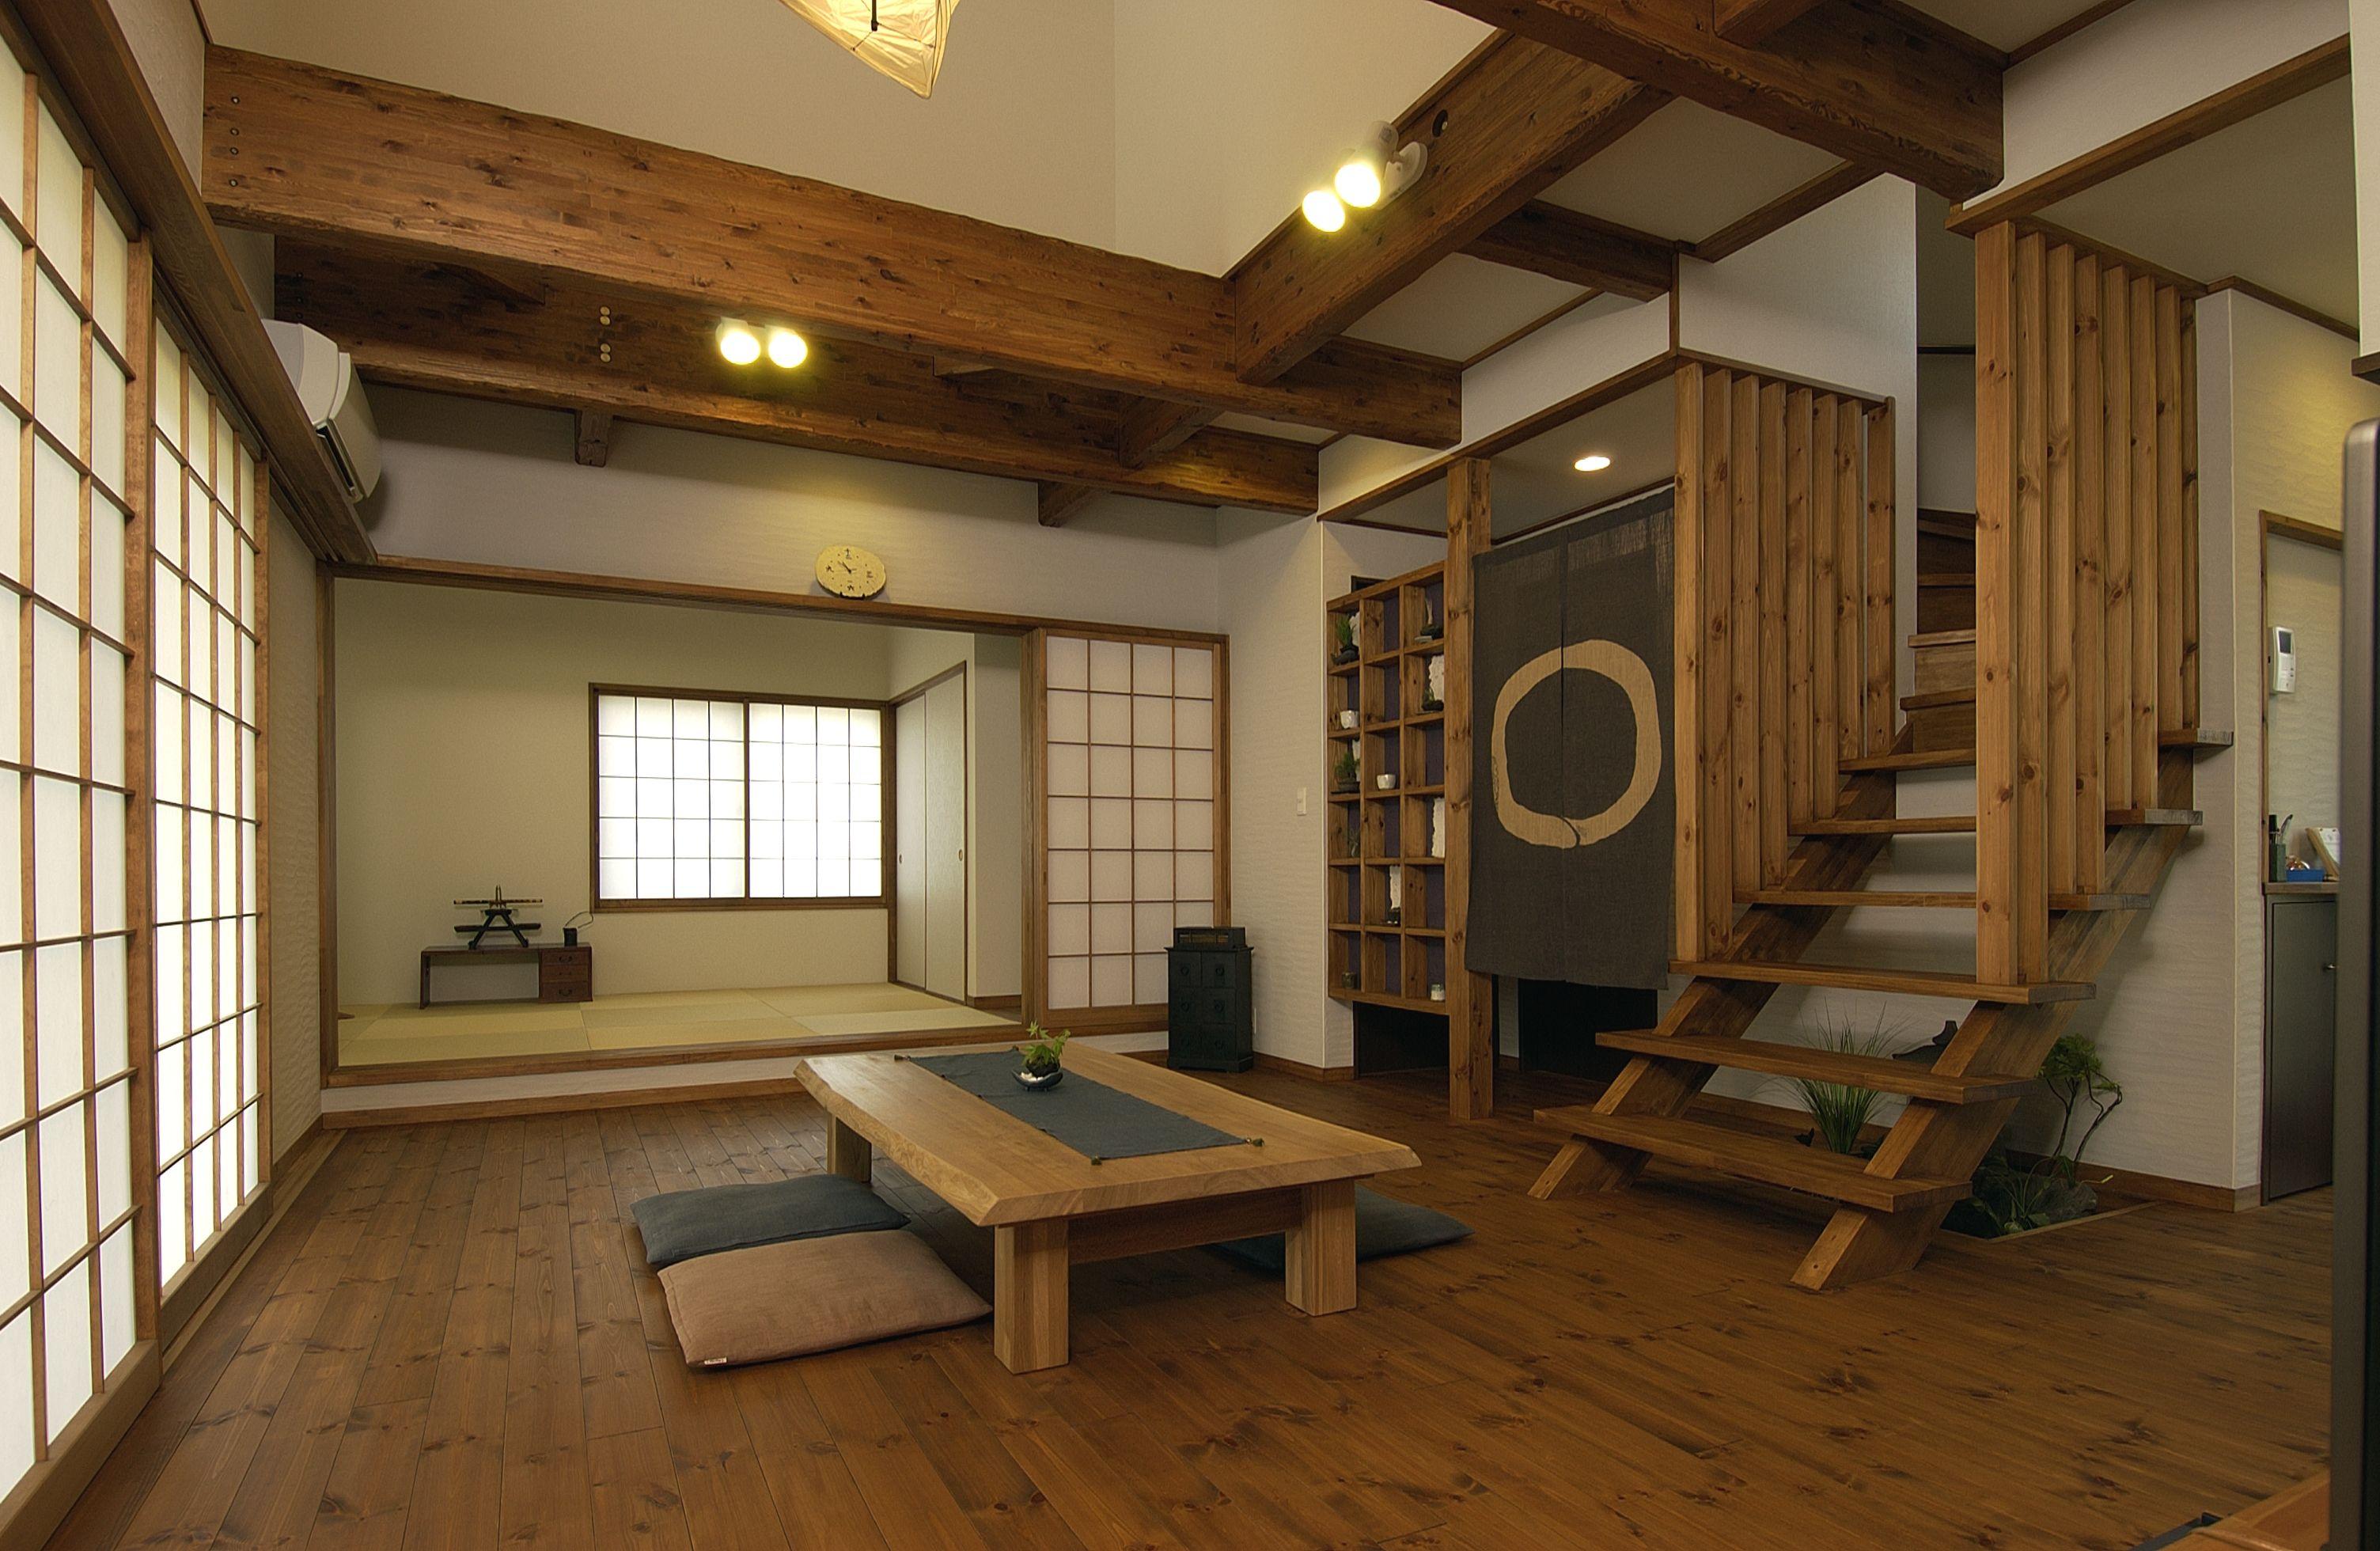 traditional japanese style in a modern way japan pinterest blog inneneinrichtung und holz. Black Bedroom Furniture Sets. Home Design Ideas